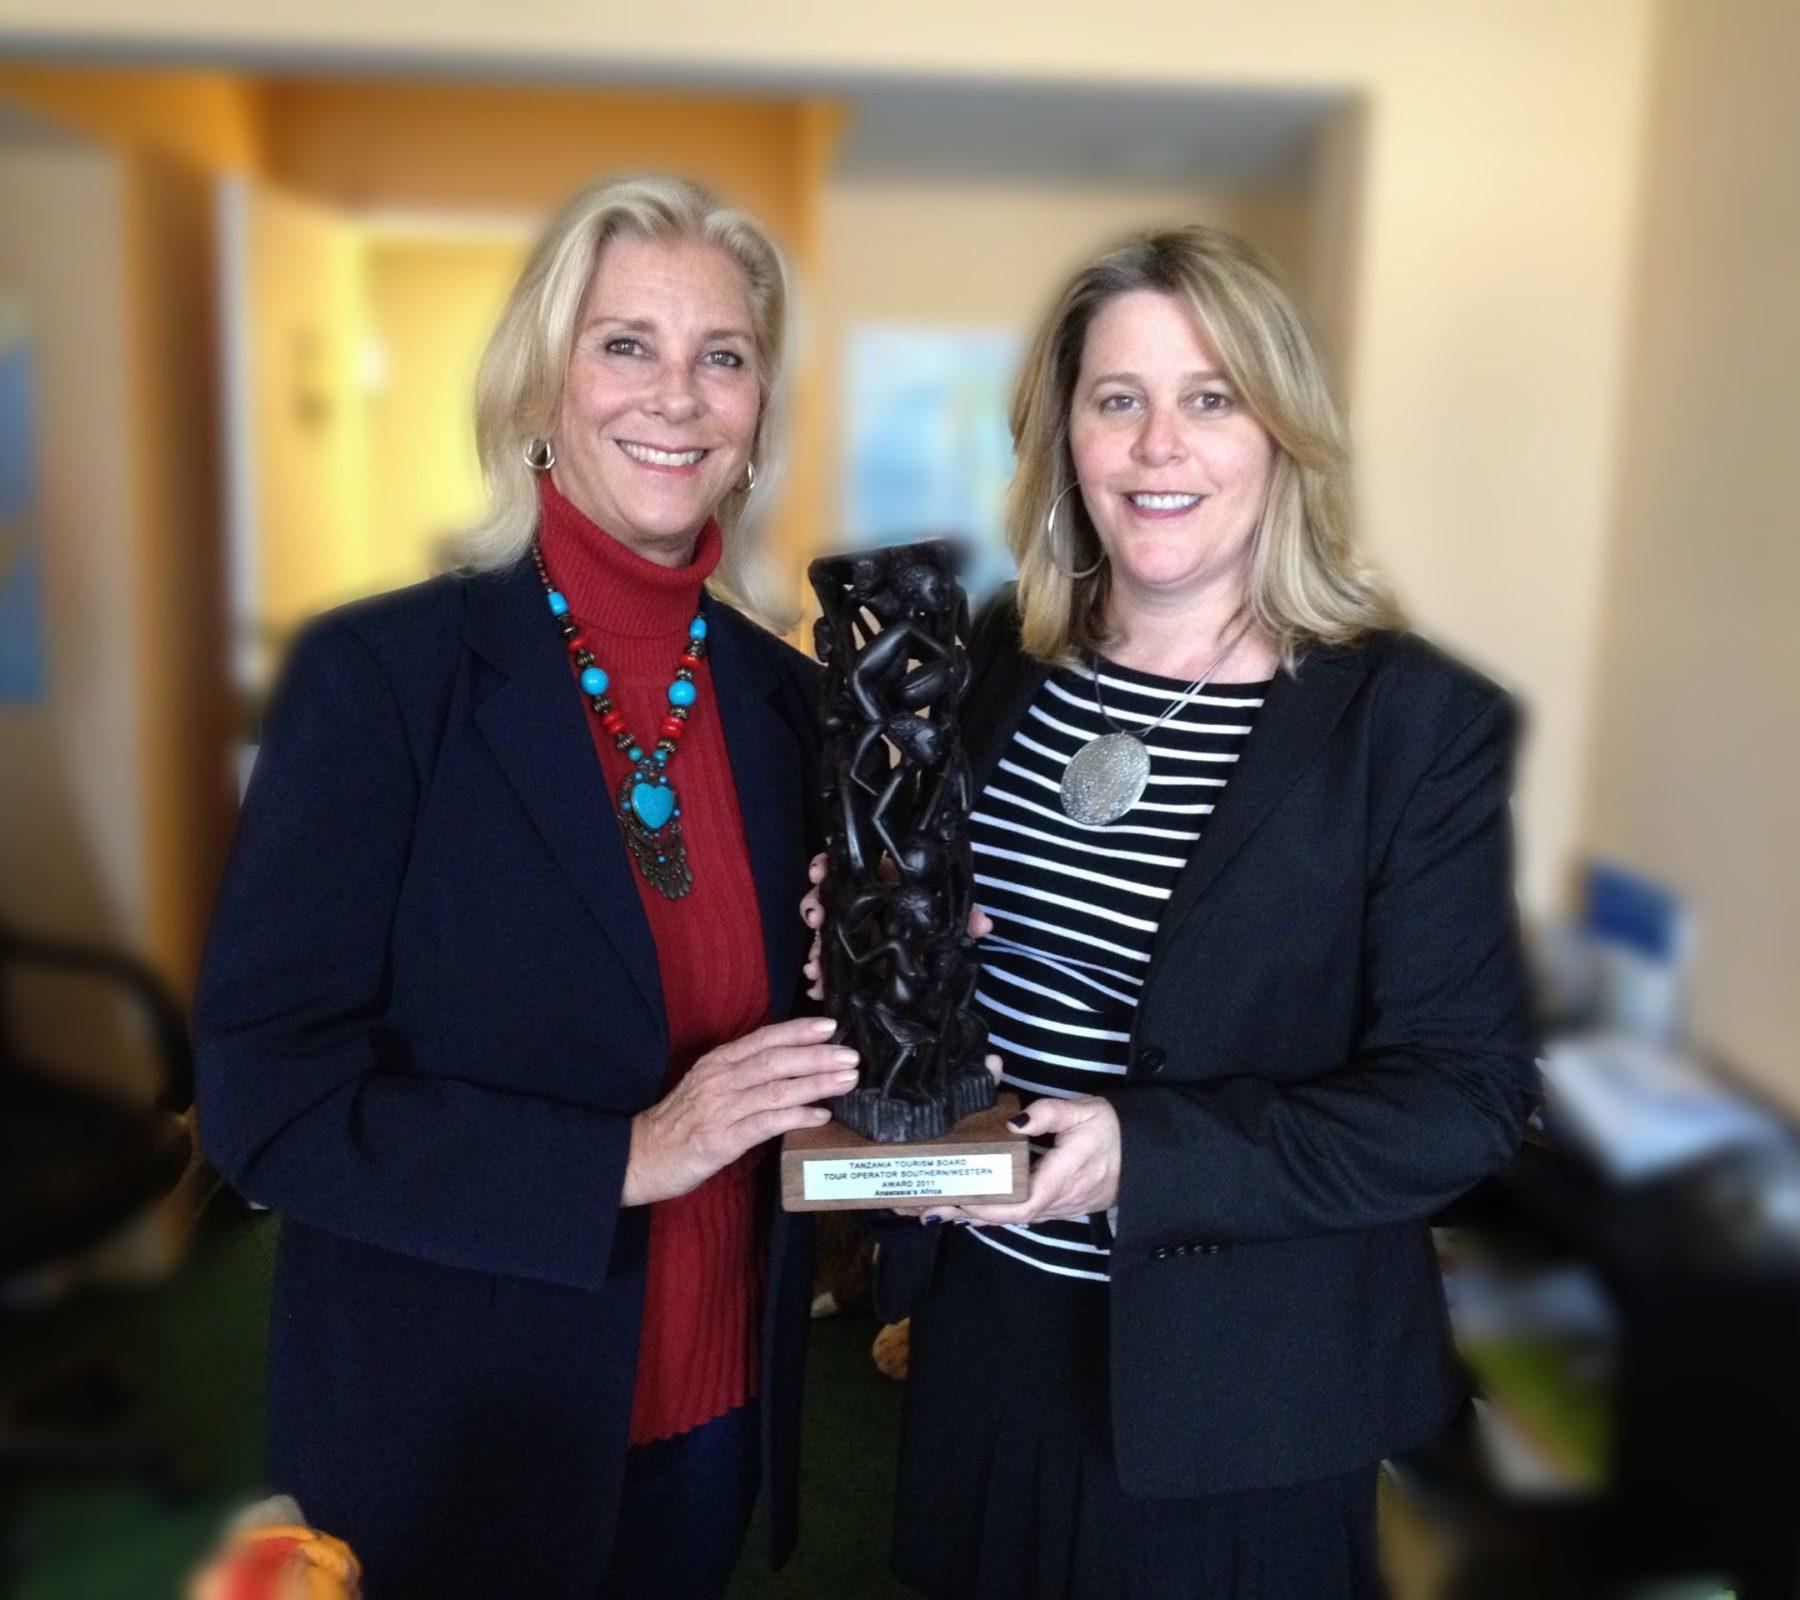 Anastasia and Karin 2012 Award